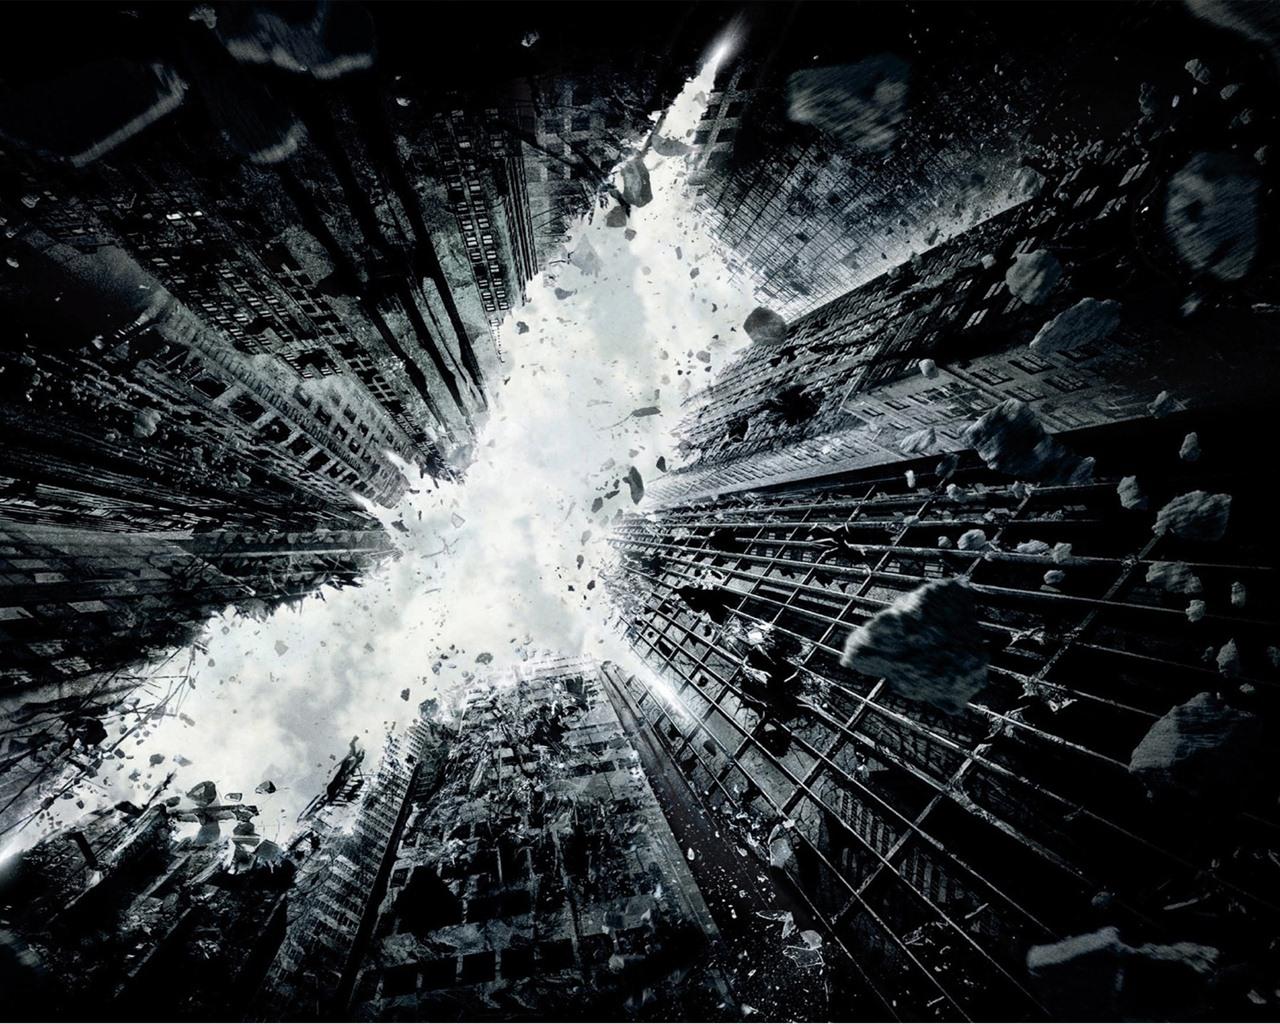 The Dark Knight Rises 2012 HD Wallpapers 6